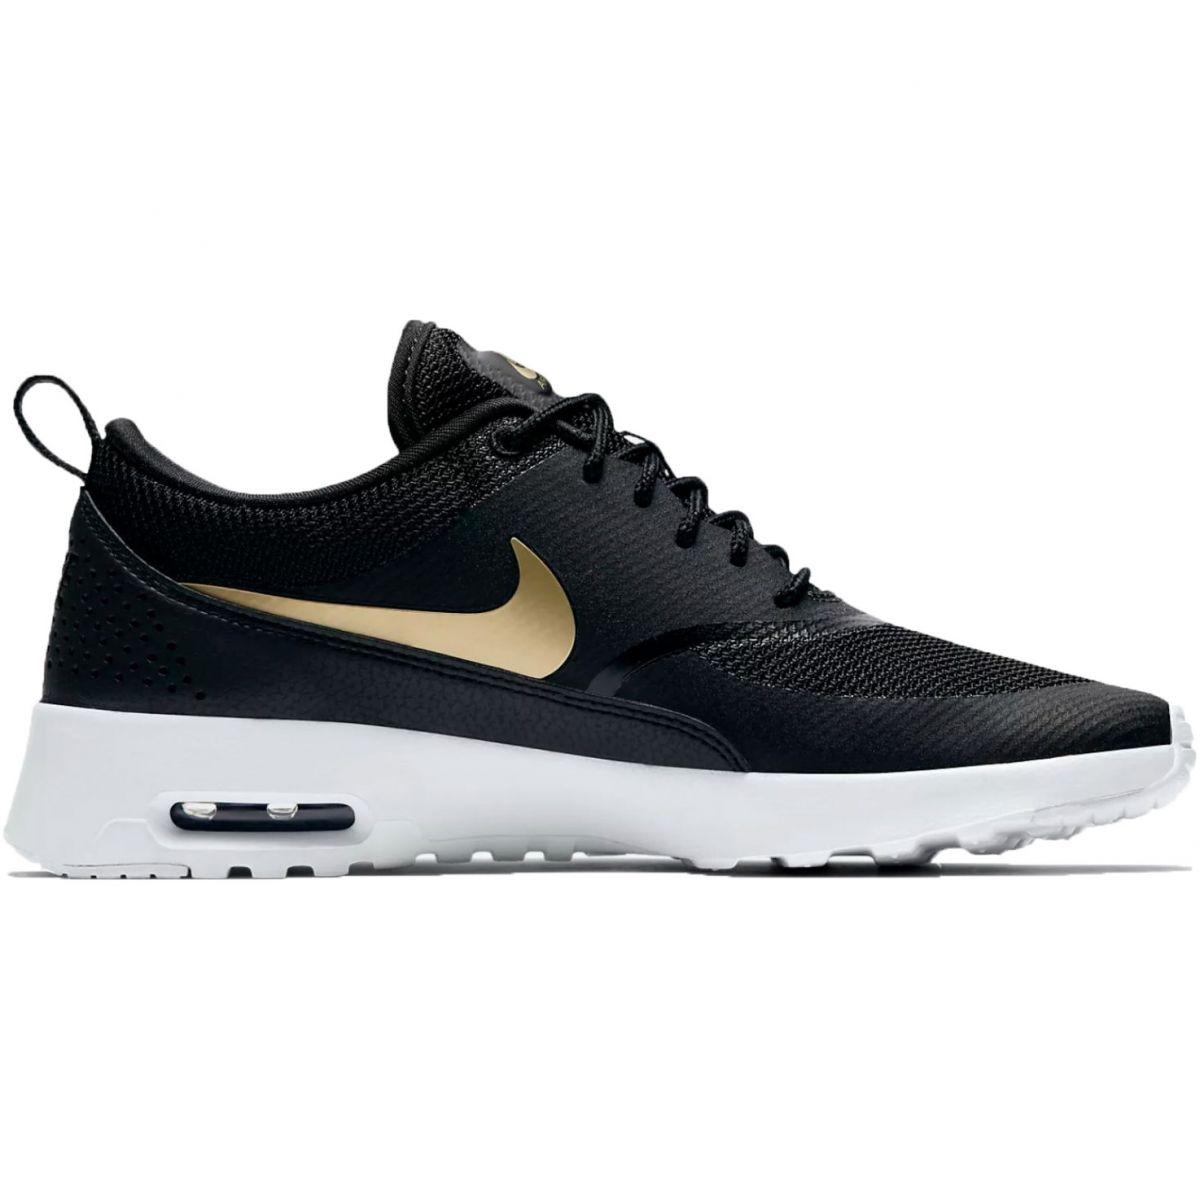 Nike Damen Sneaker Aj2010 002 schwarz schwarz